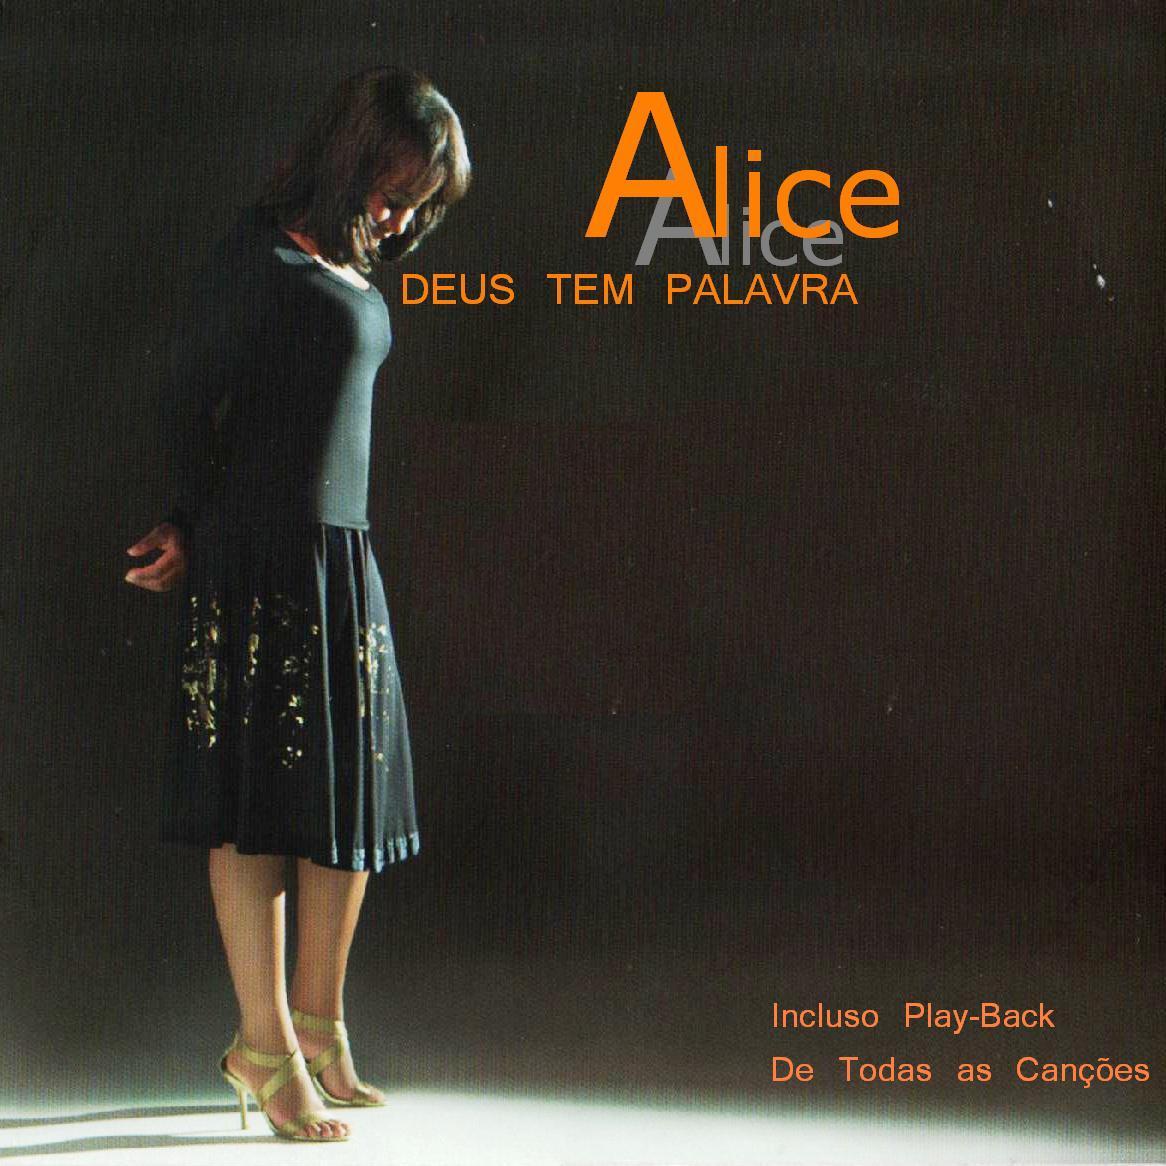 Alice - Deus tem palavra